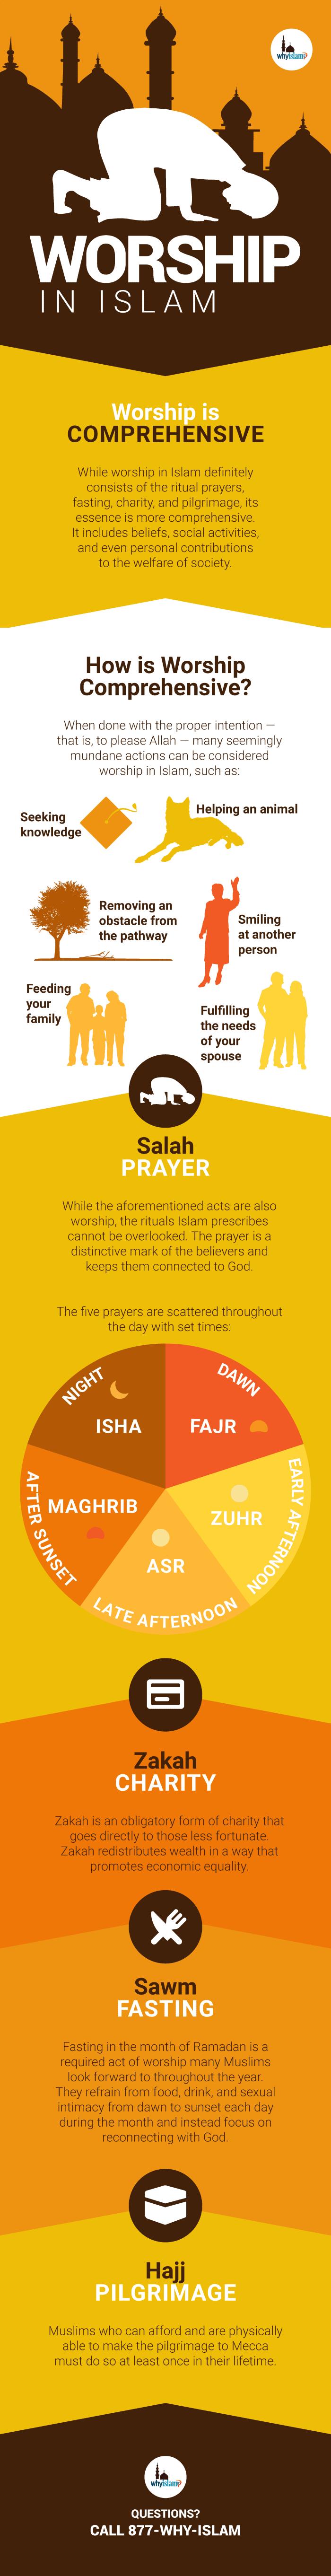 Worship in Islam Infographic